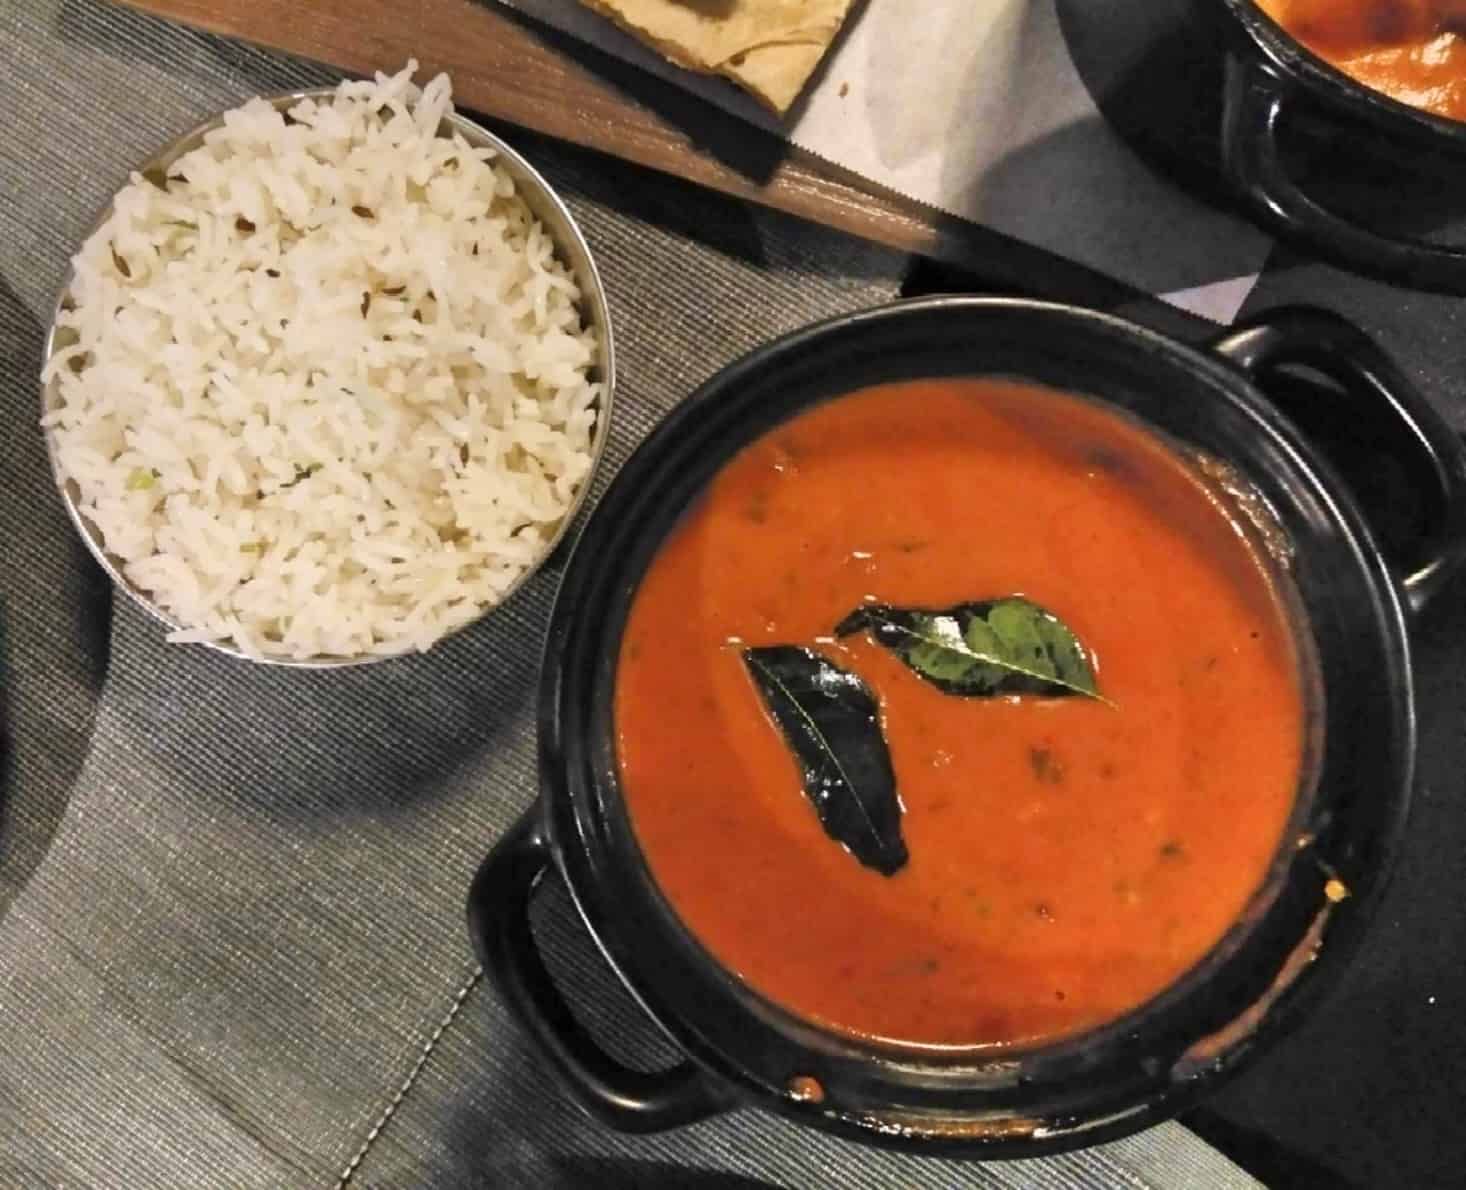 Flour-Bukit-Damansara-North-Indian-restaurant-Kuala-Lumpur-Malaysia-Travel-Mermaid-01